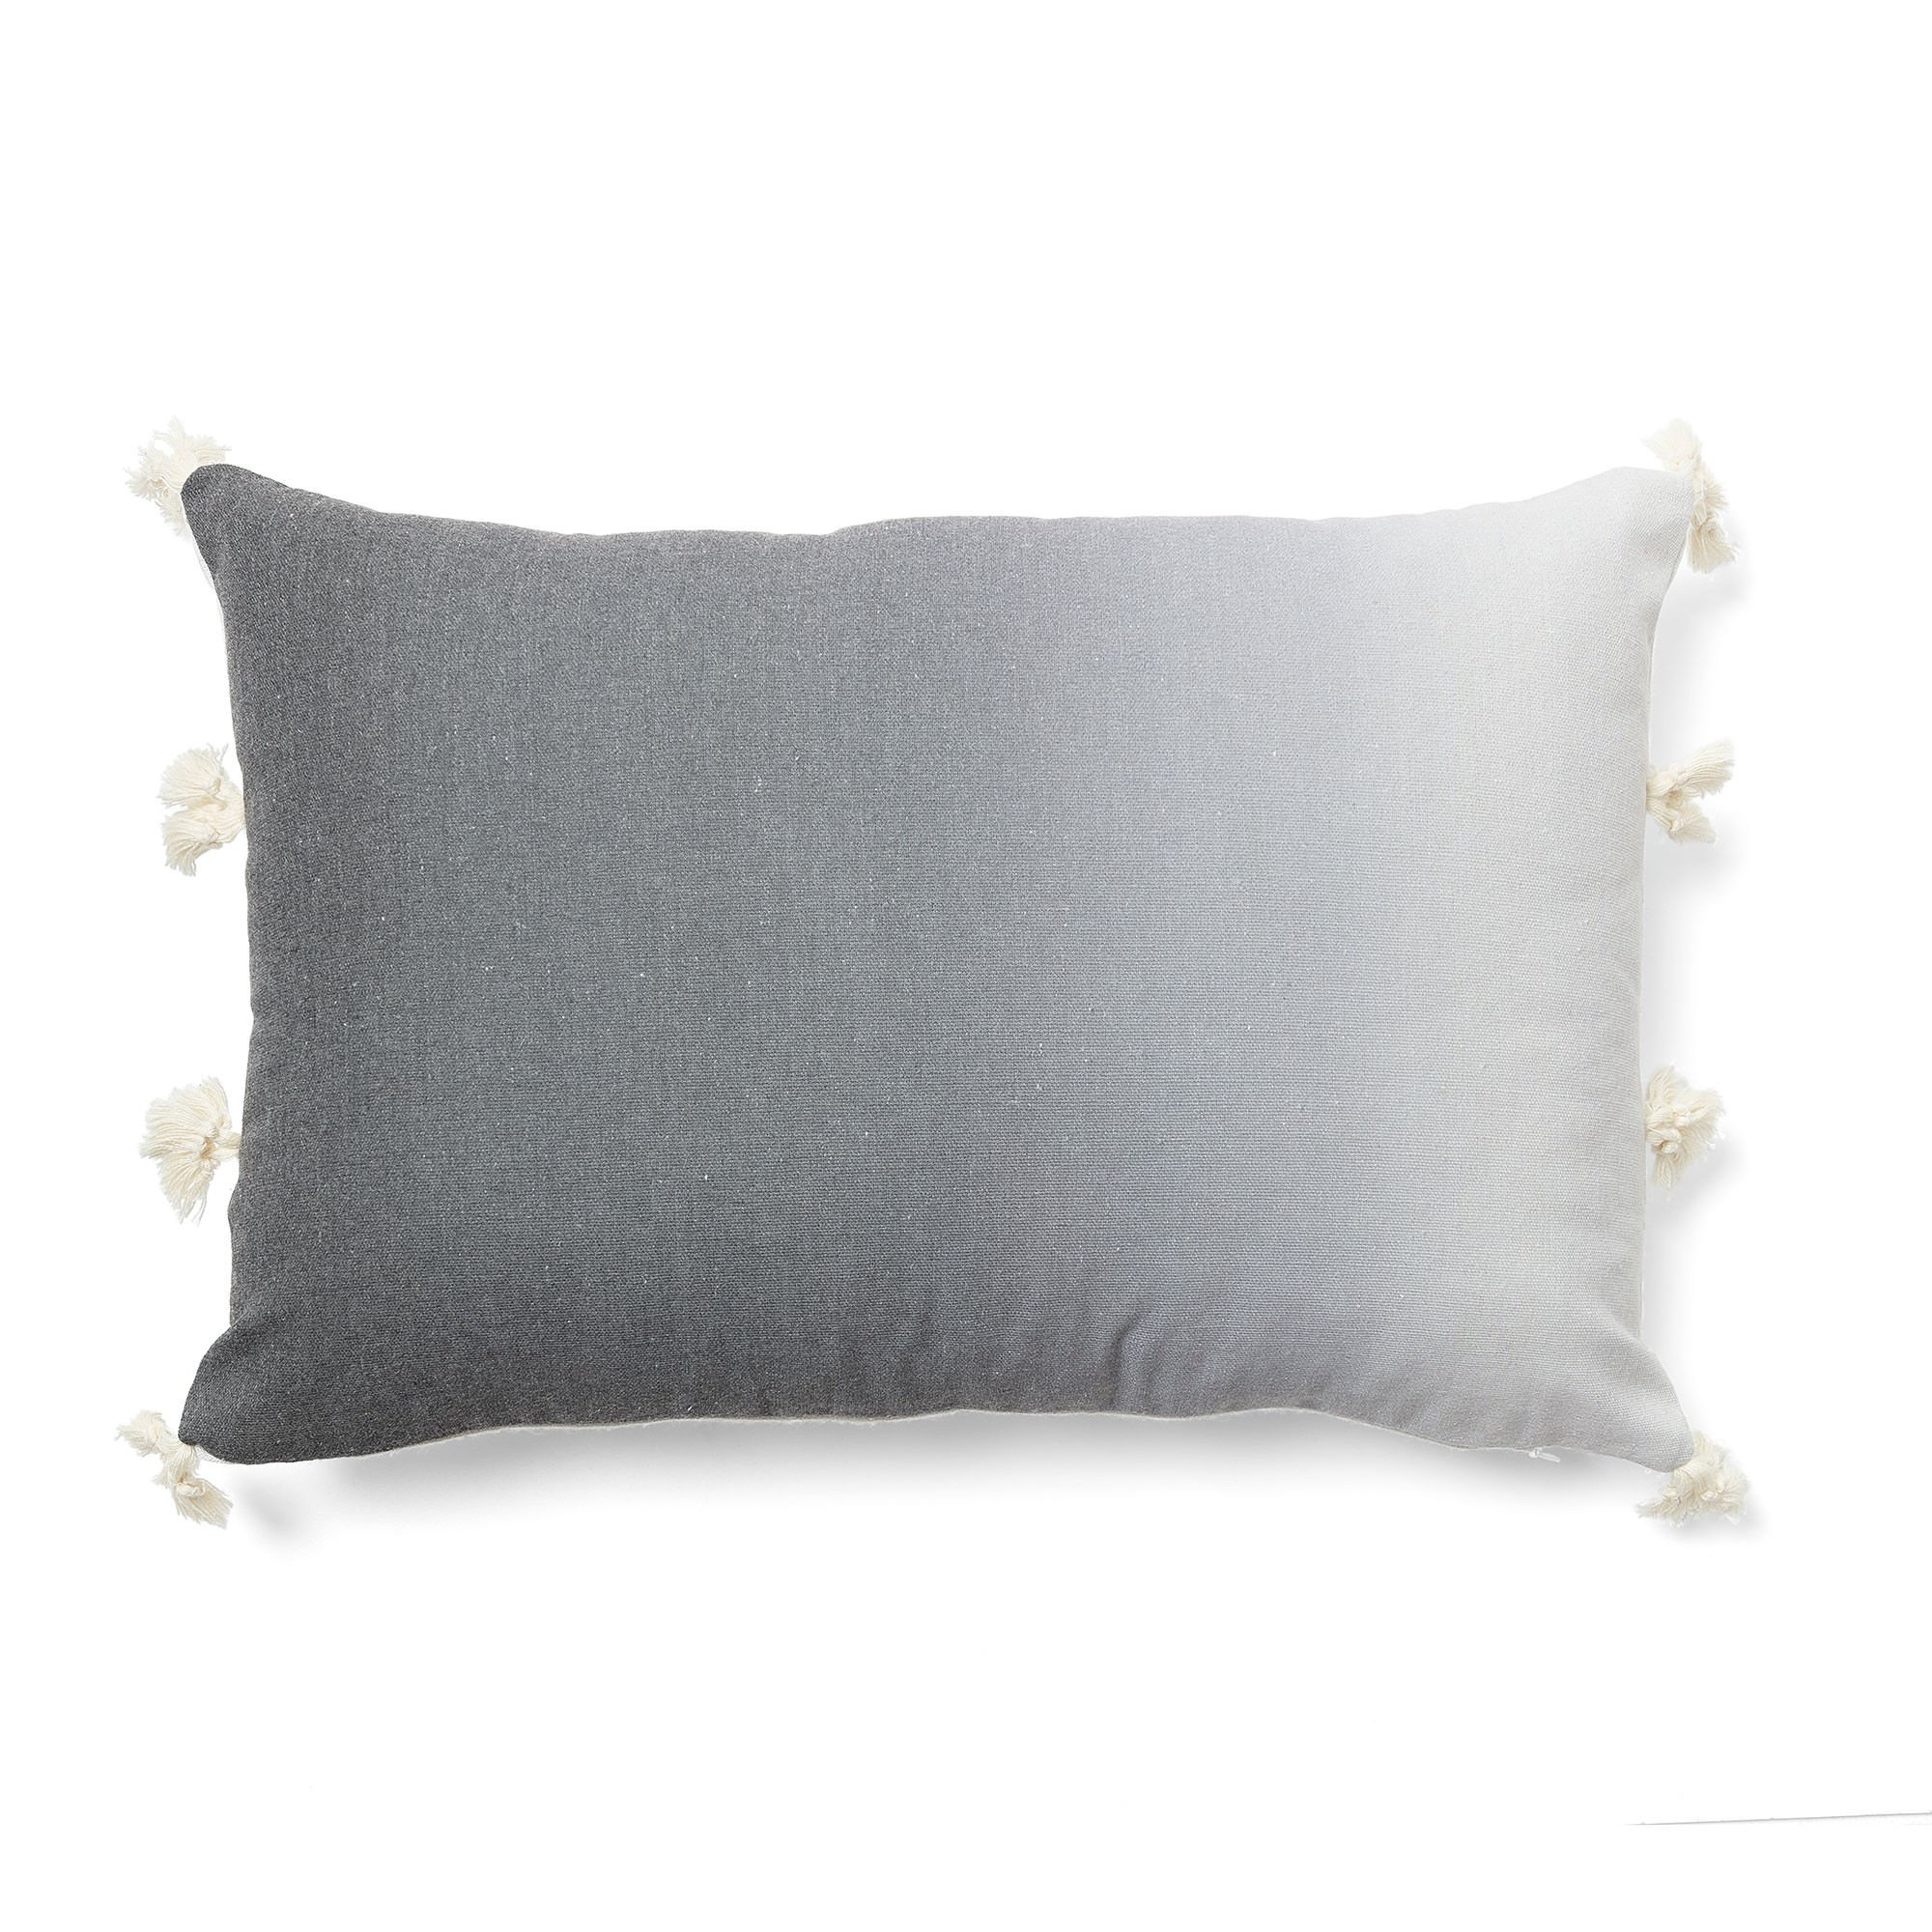 Pia Fabric Lumbar Cushion